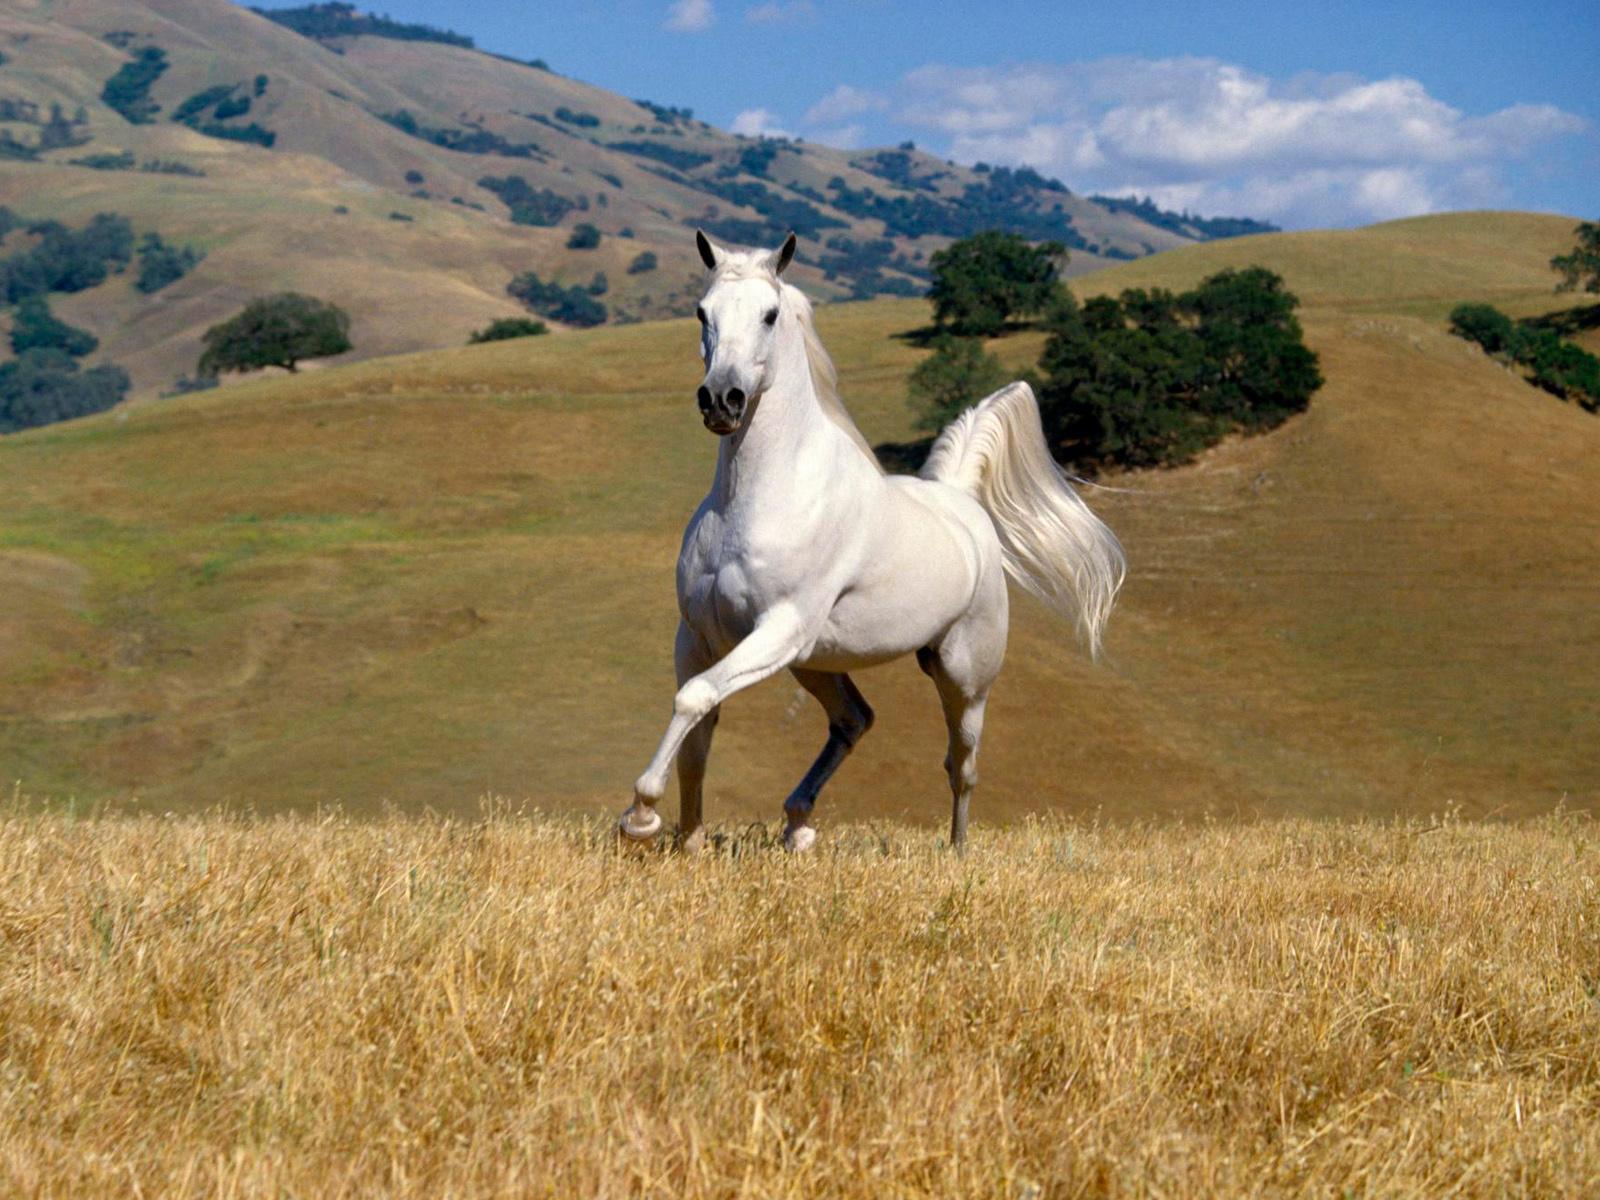 free horse wallpaper hd 19882